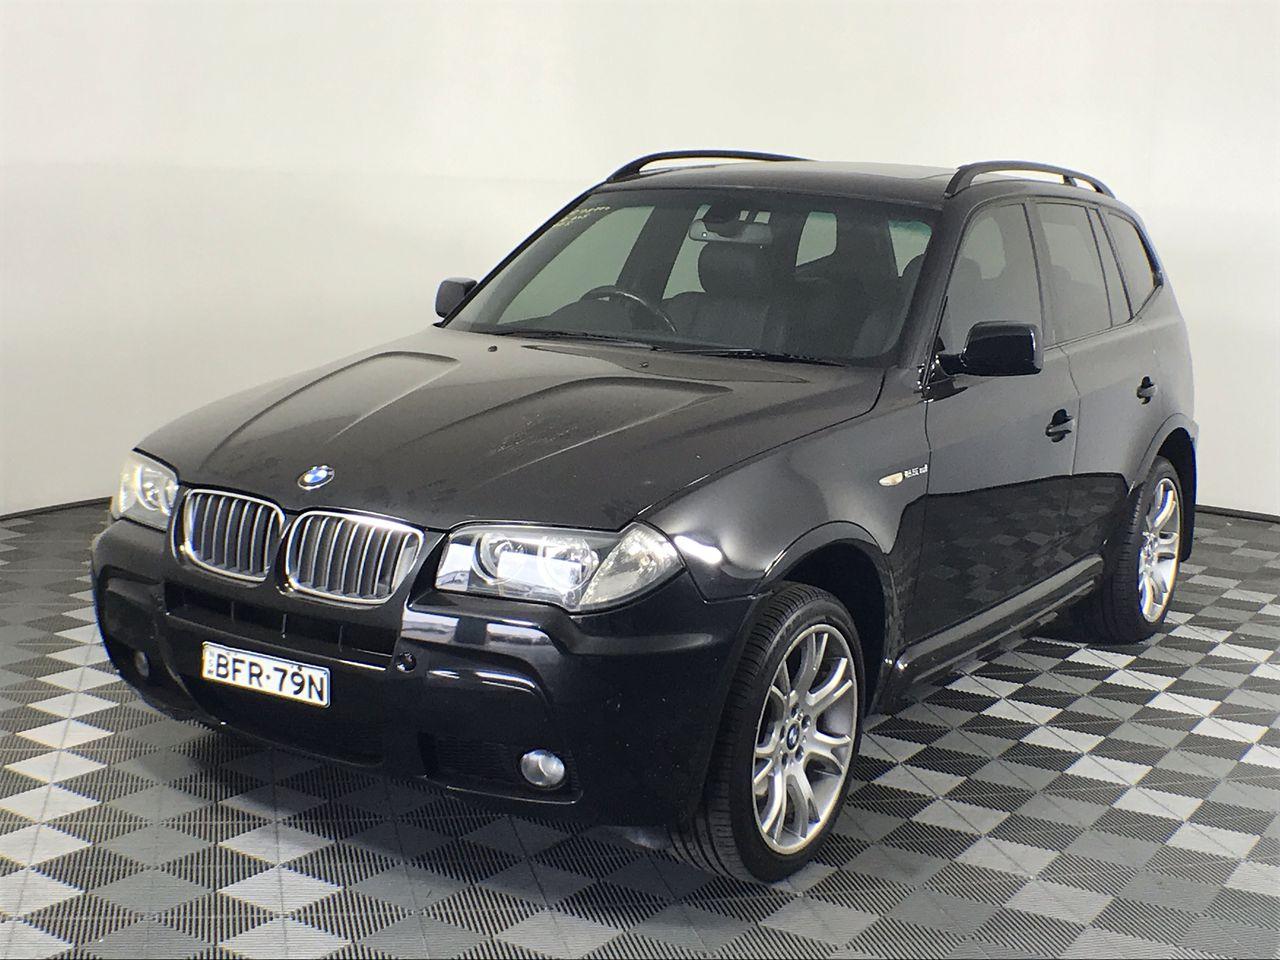 2007 BMW X3 2.5si E83 Automatic Wagon 92,986km